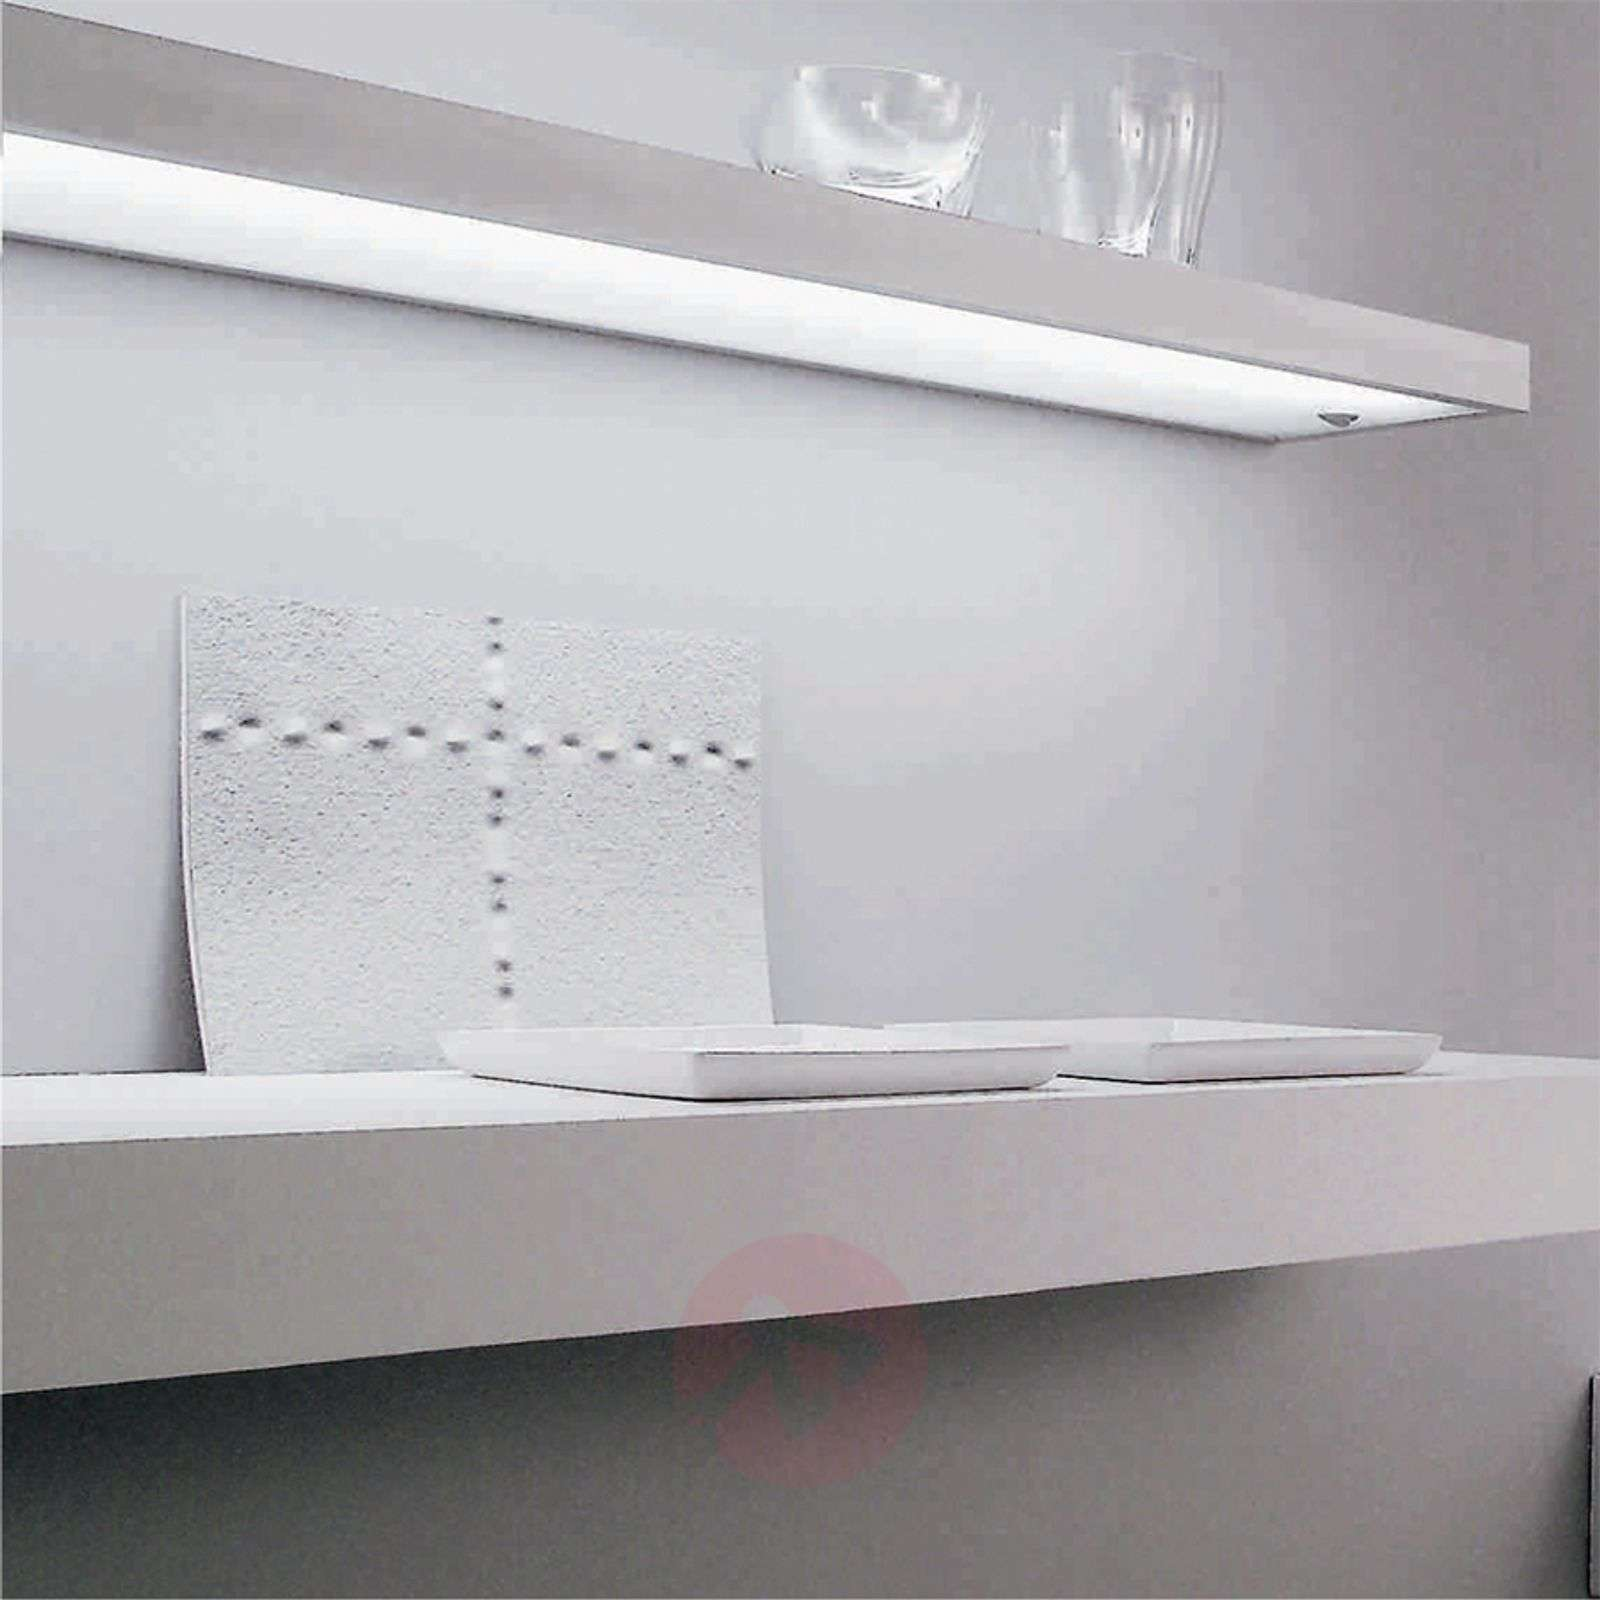 Shelf LIGHTBOARD with light, height 5.2cm-9020011X-04